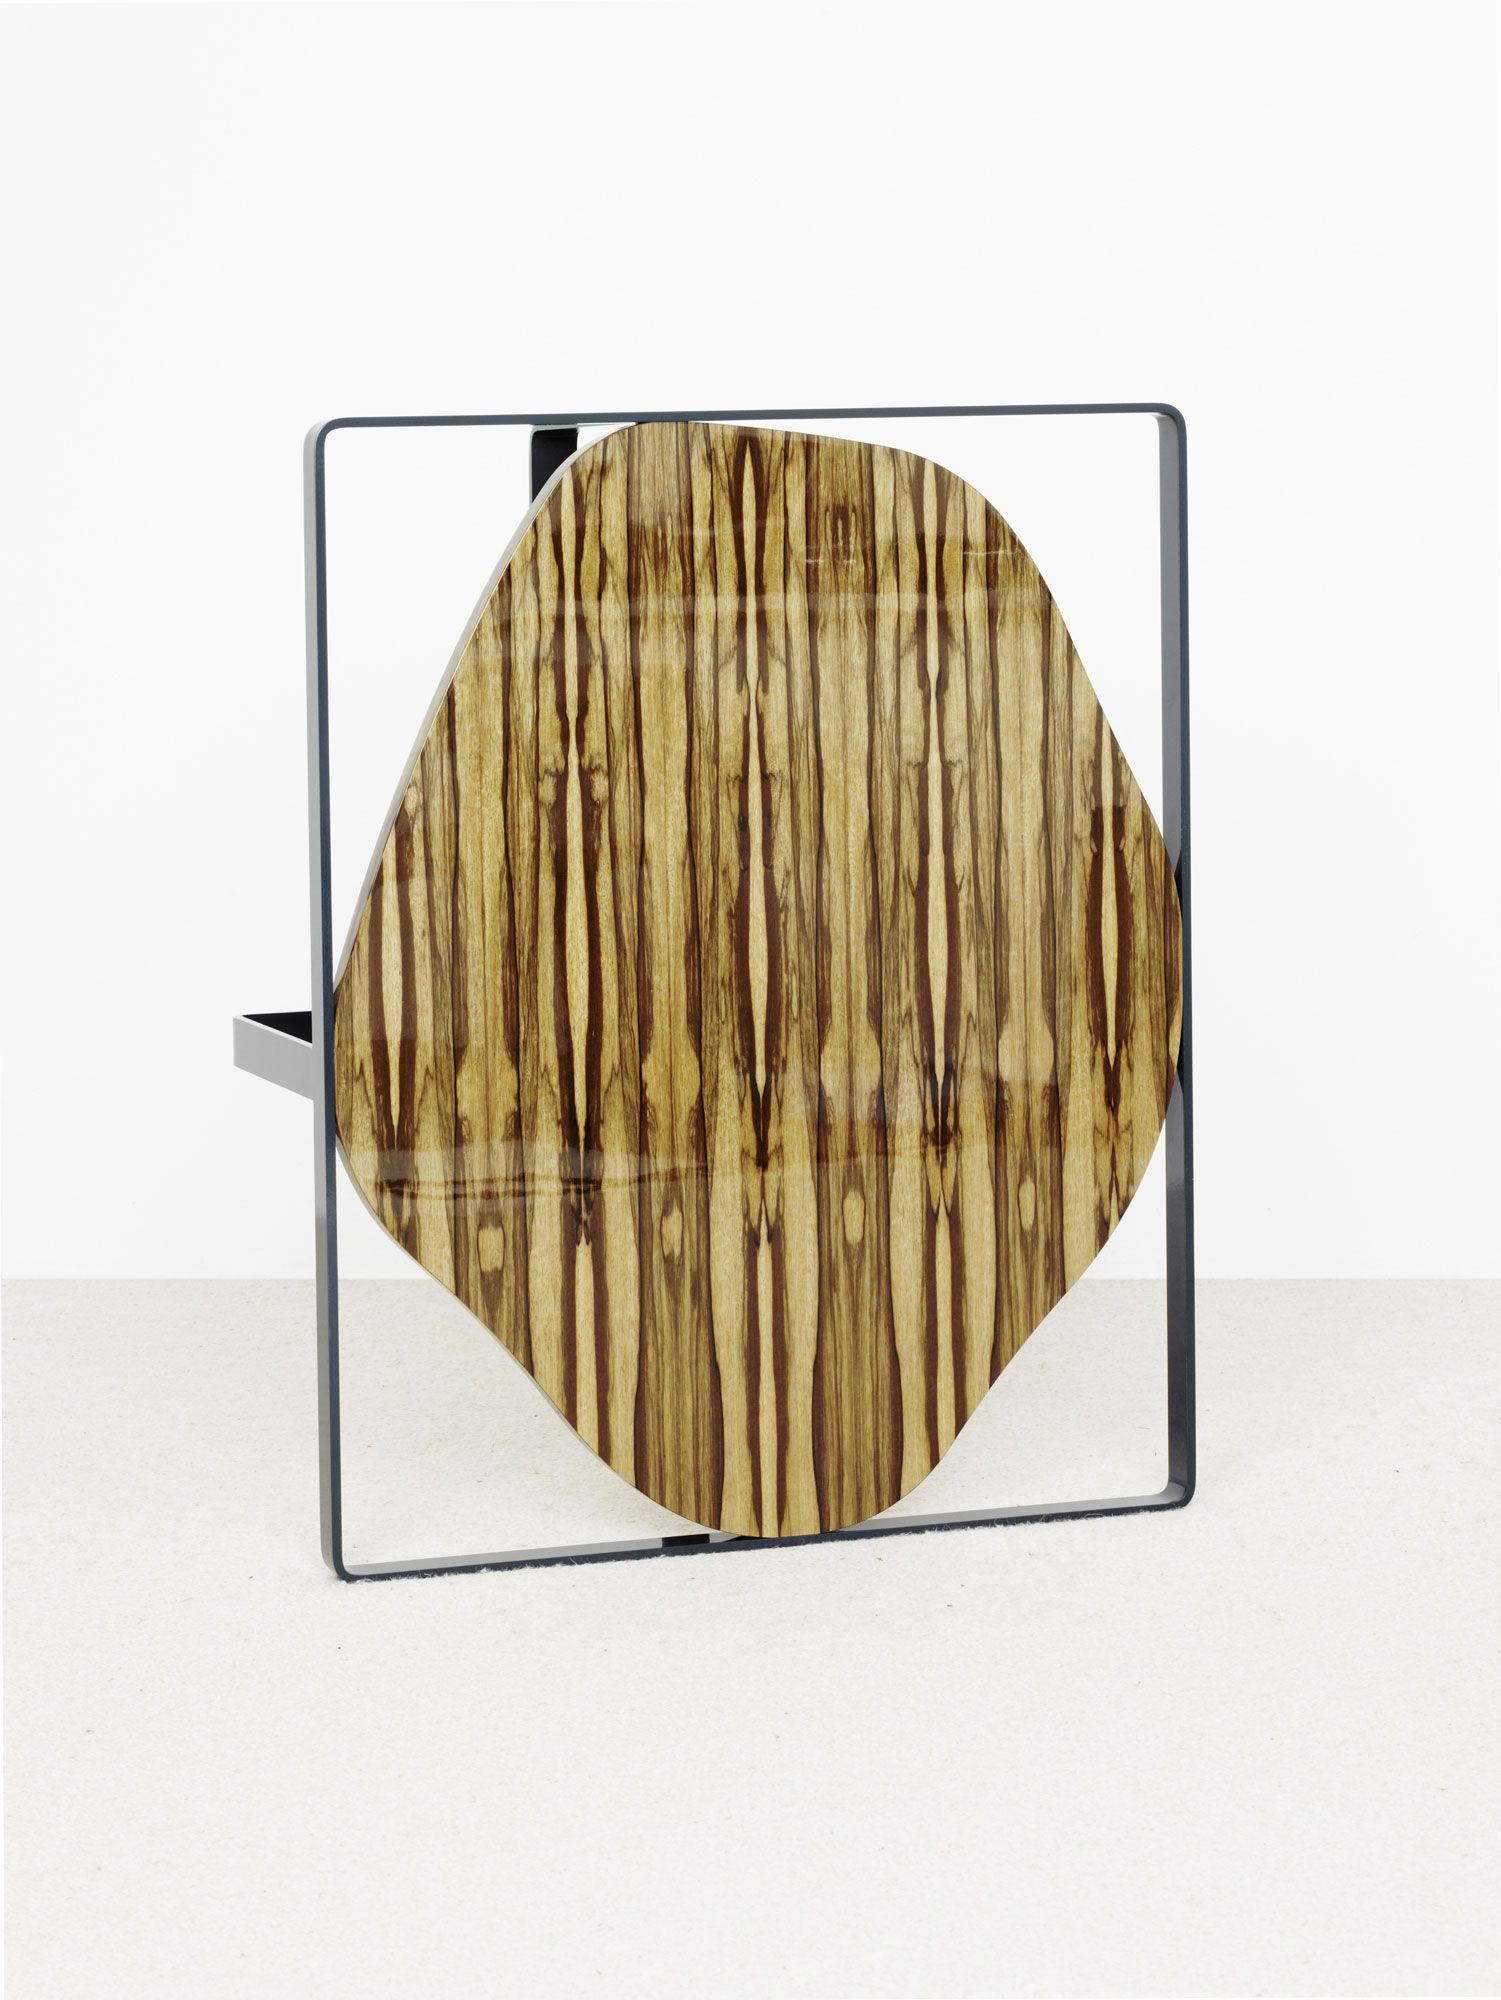 193410ef2b6404935a4fa47d5546c642 Luxe De Mini Table Basse Concept